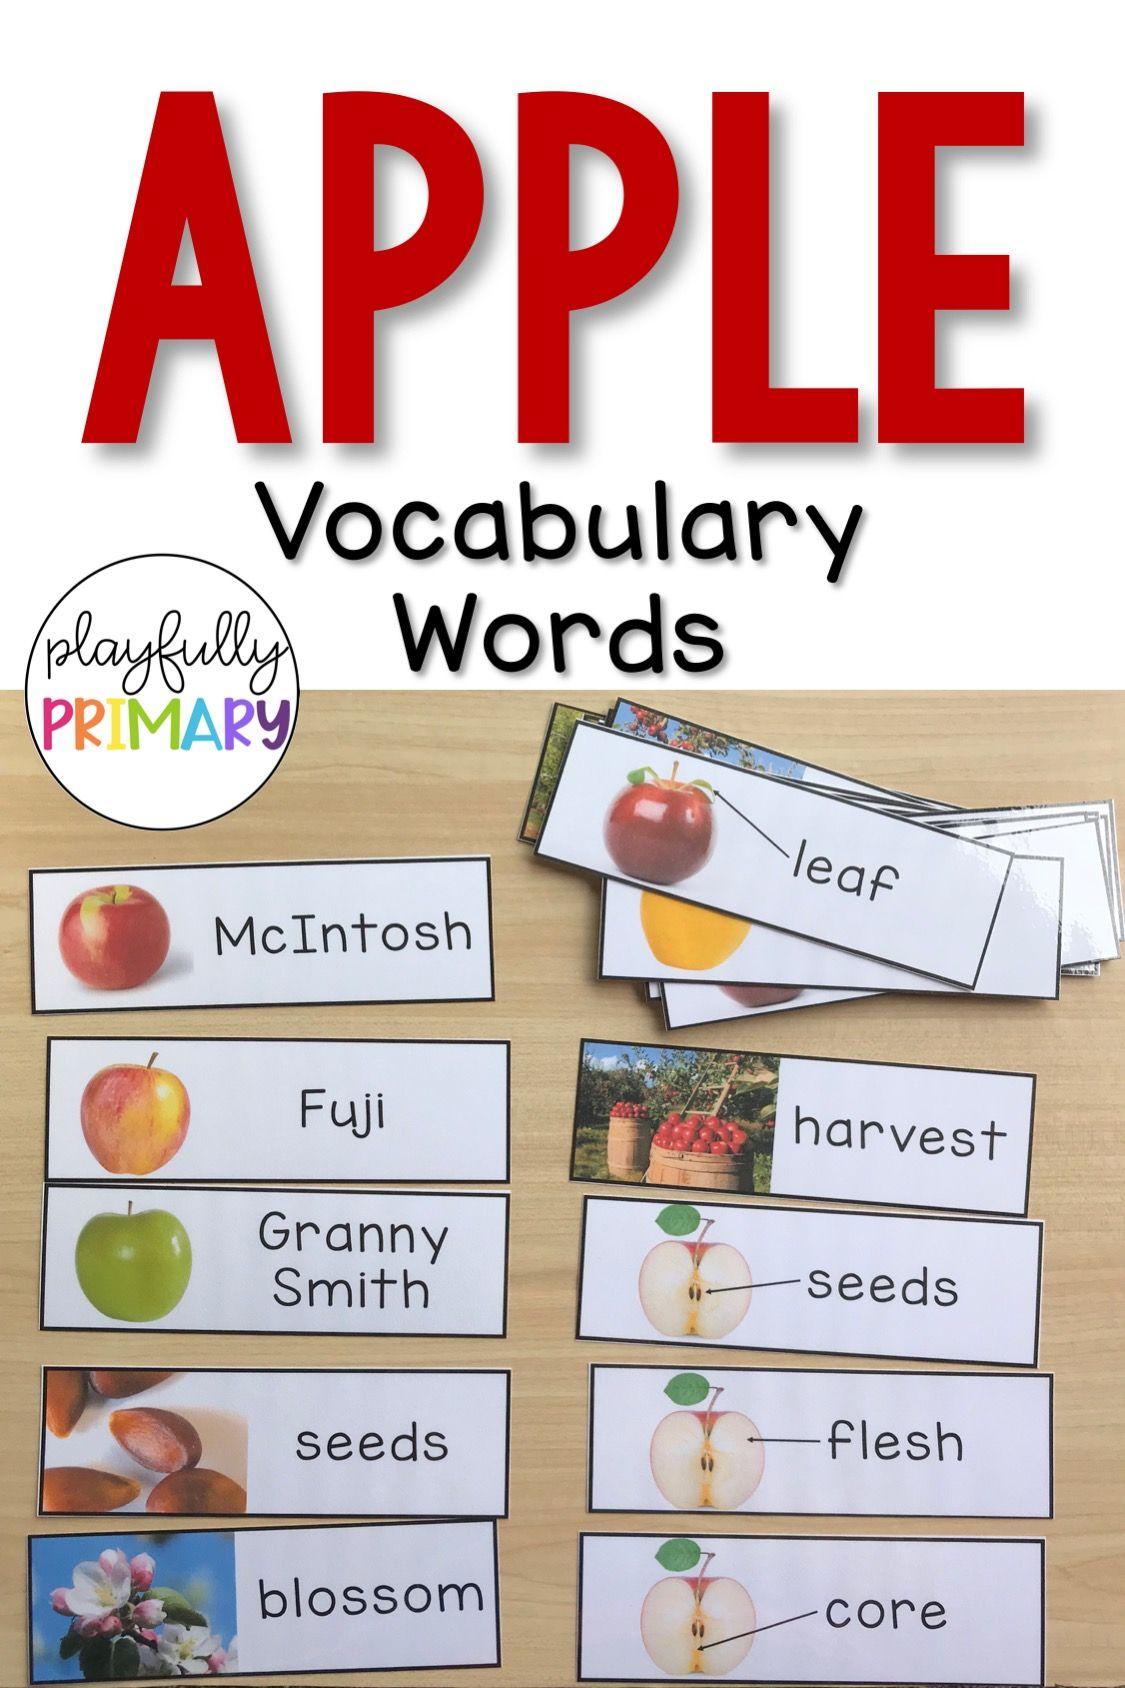 Apple Vocabulary Word Wall Print & D'Nealian Shop